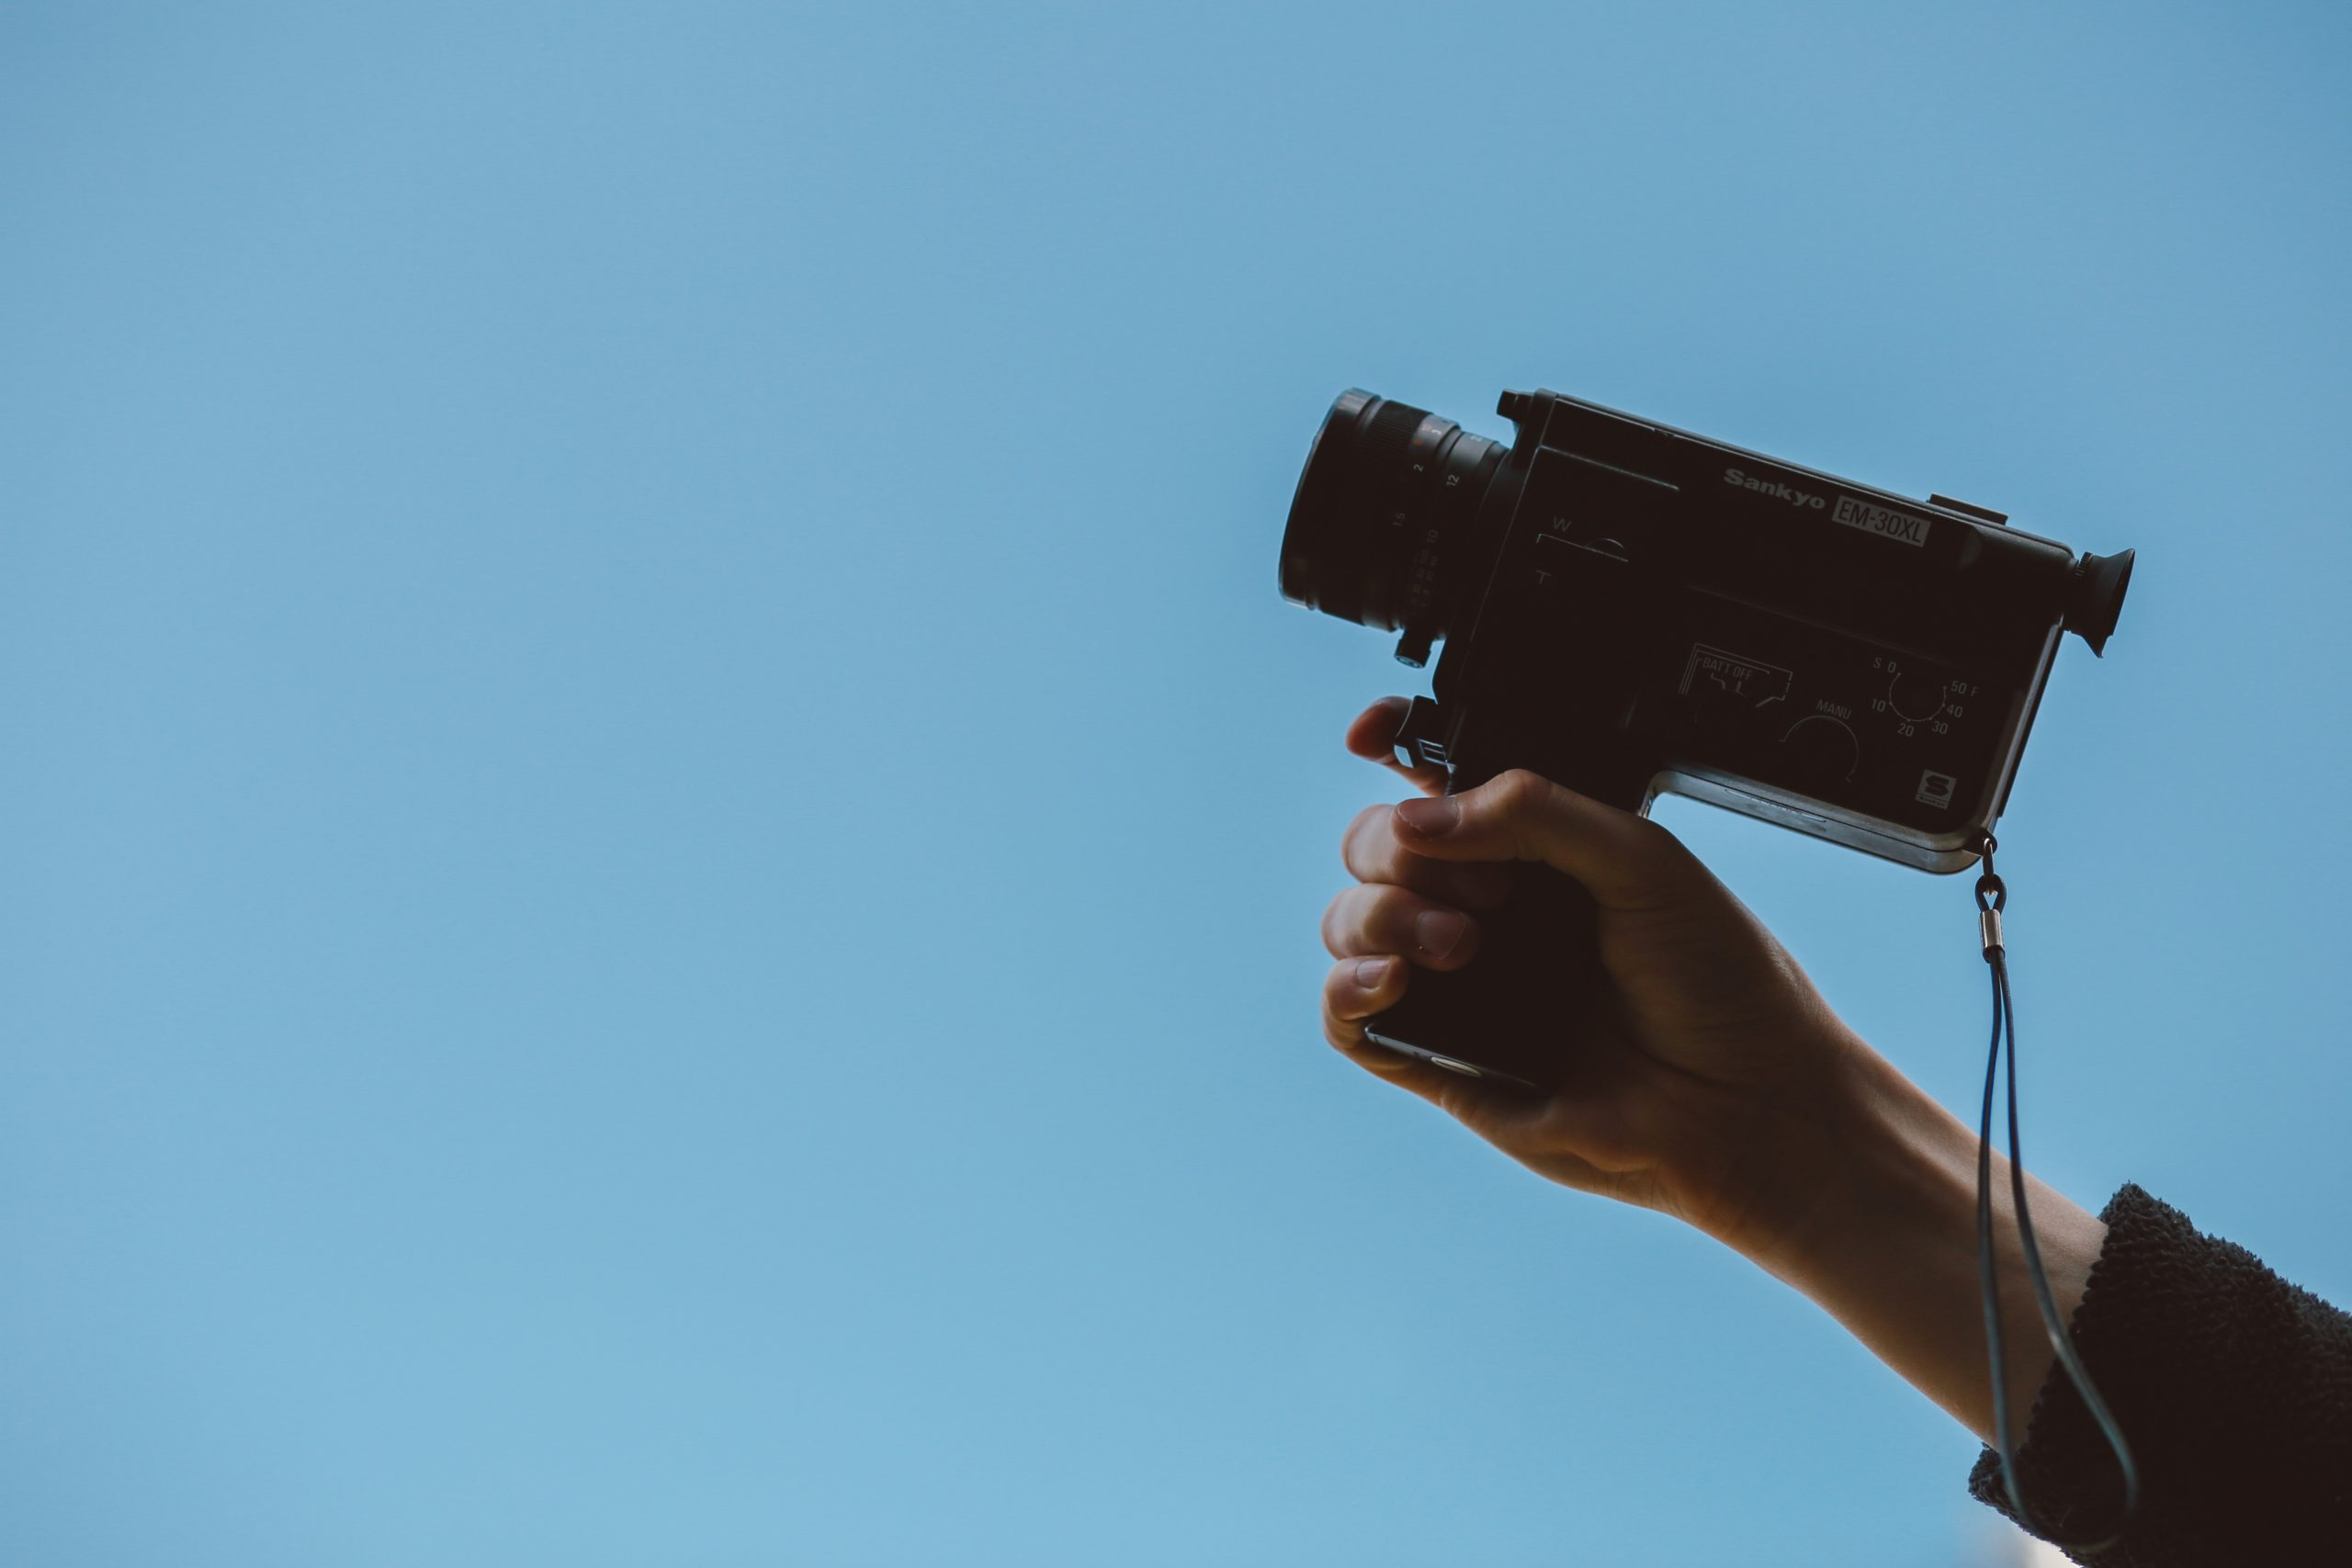 old school video camera